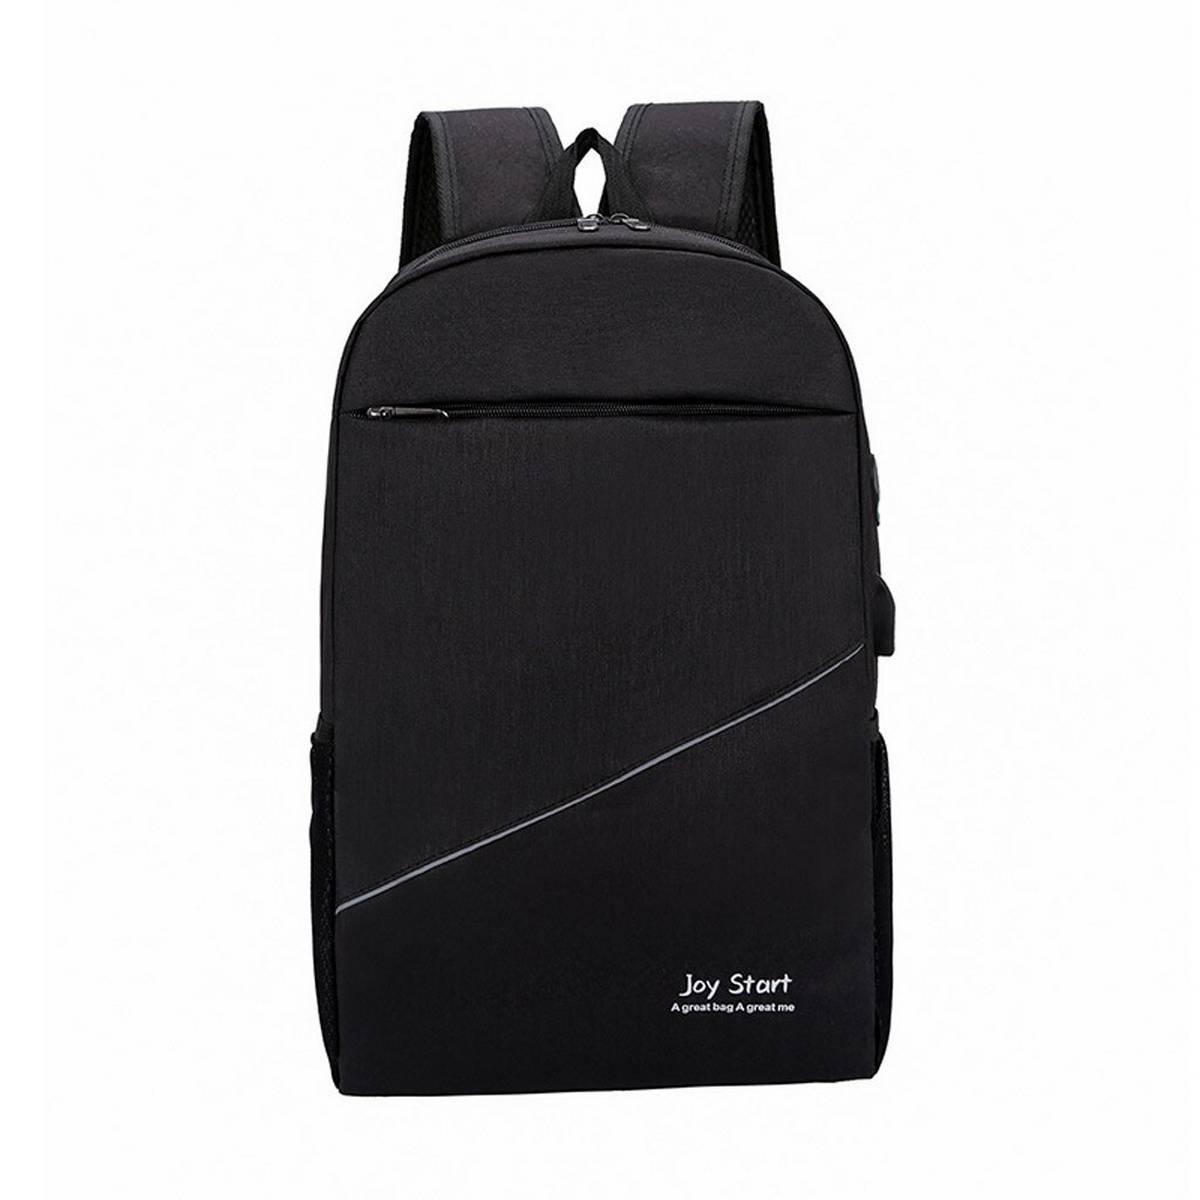 Joy Star School Bag for Boys and Girsl Backpacks Book Bags Cute Plane Schoolbag Uni Collage Men Women